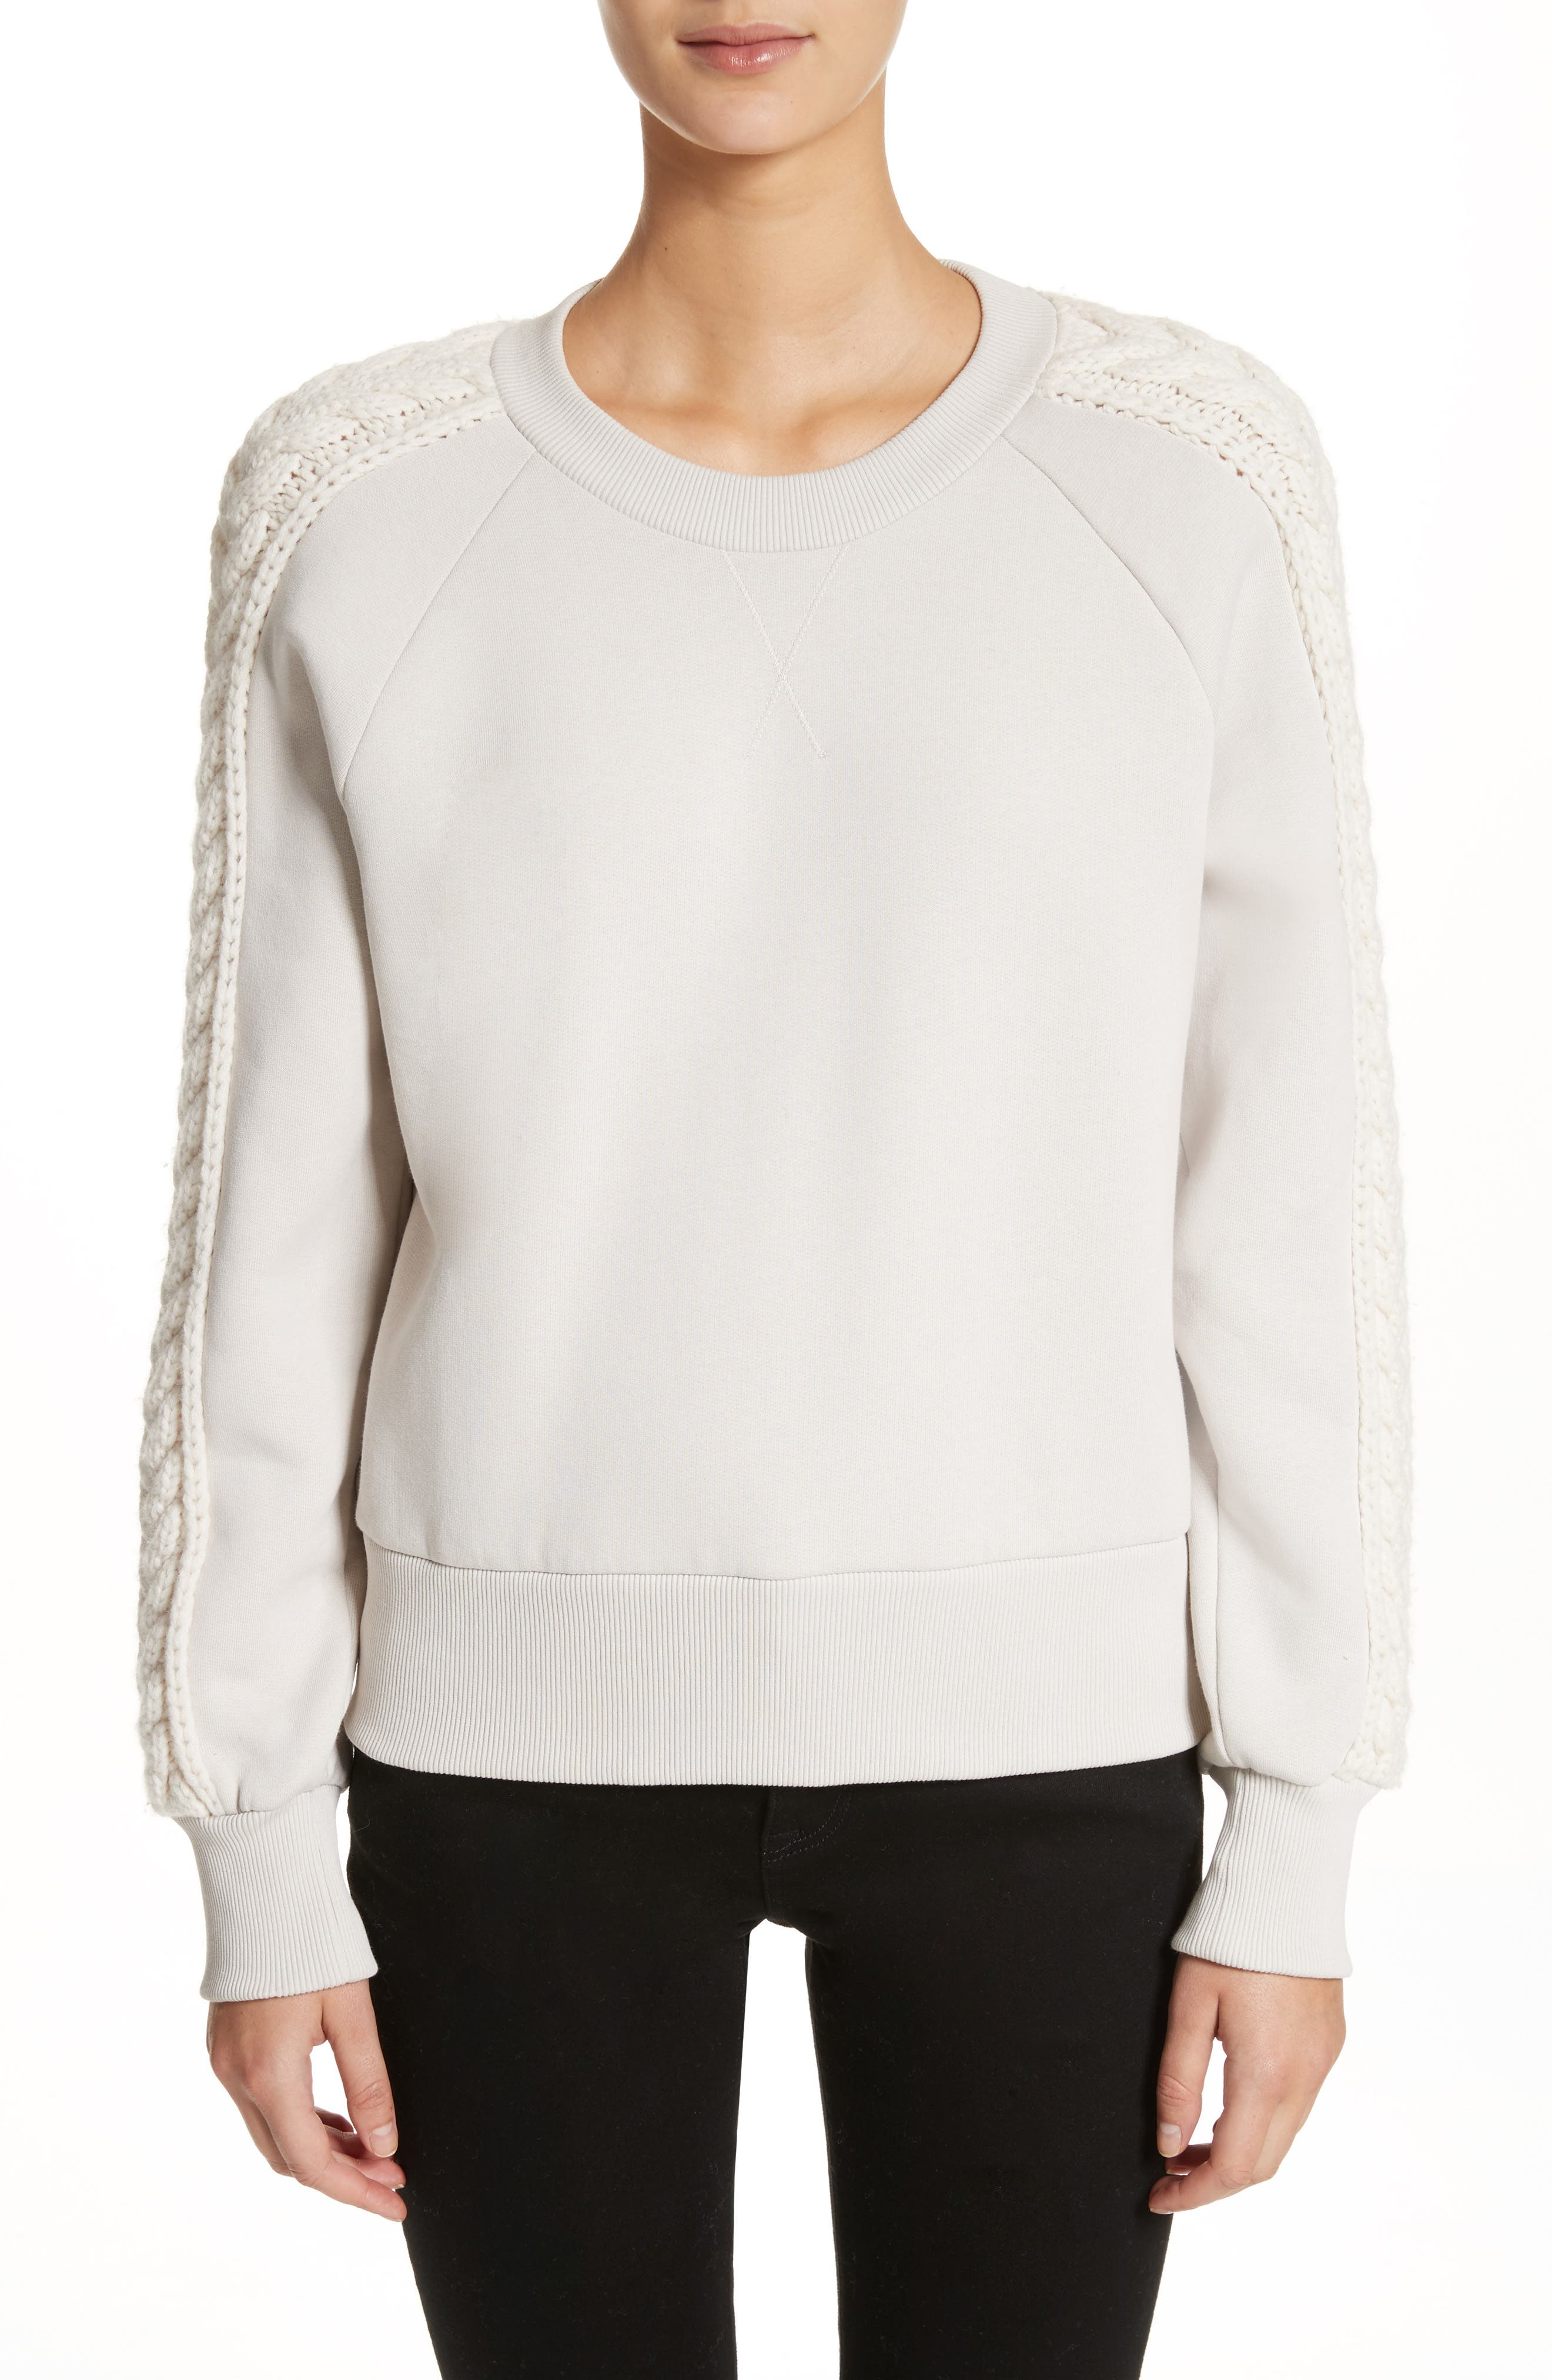 Burberry Selho Sweatshirt